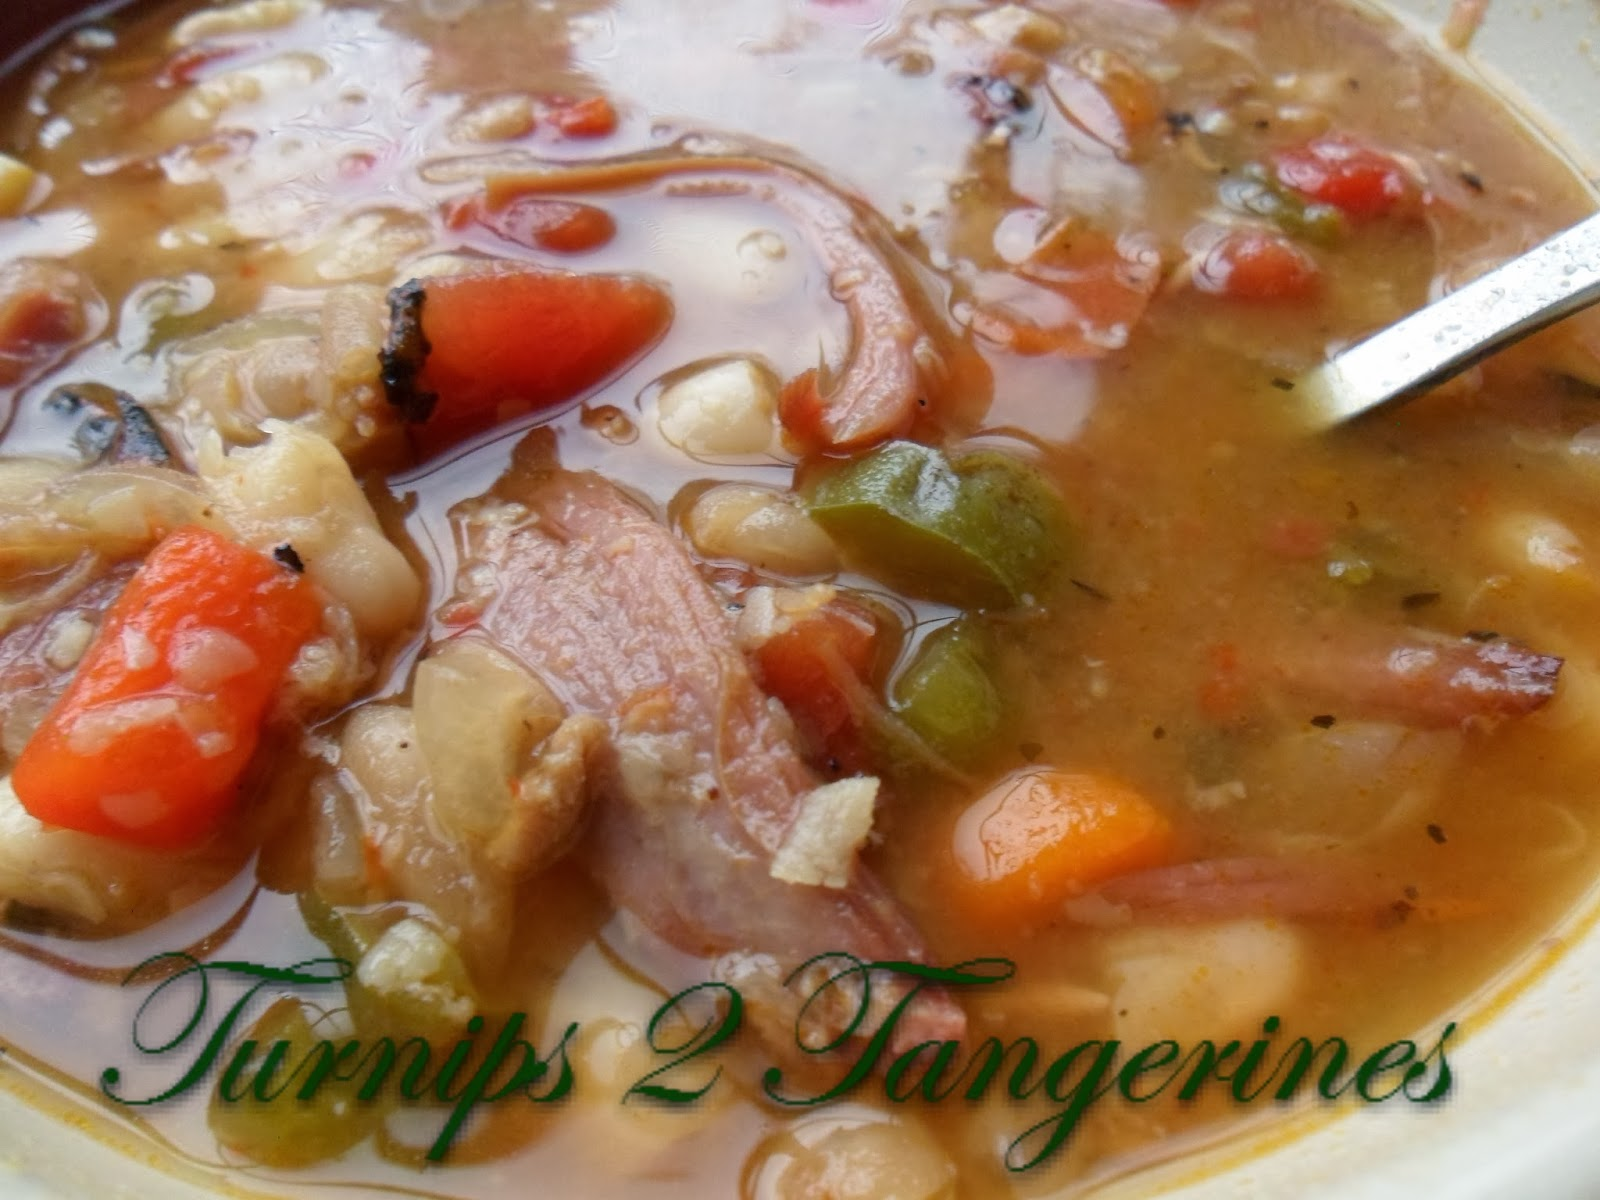 Turnips 2 Tangerines: White Bean and Ham Soup